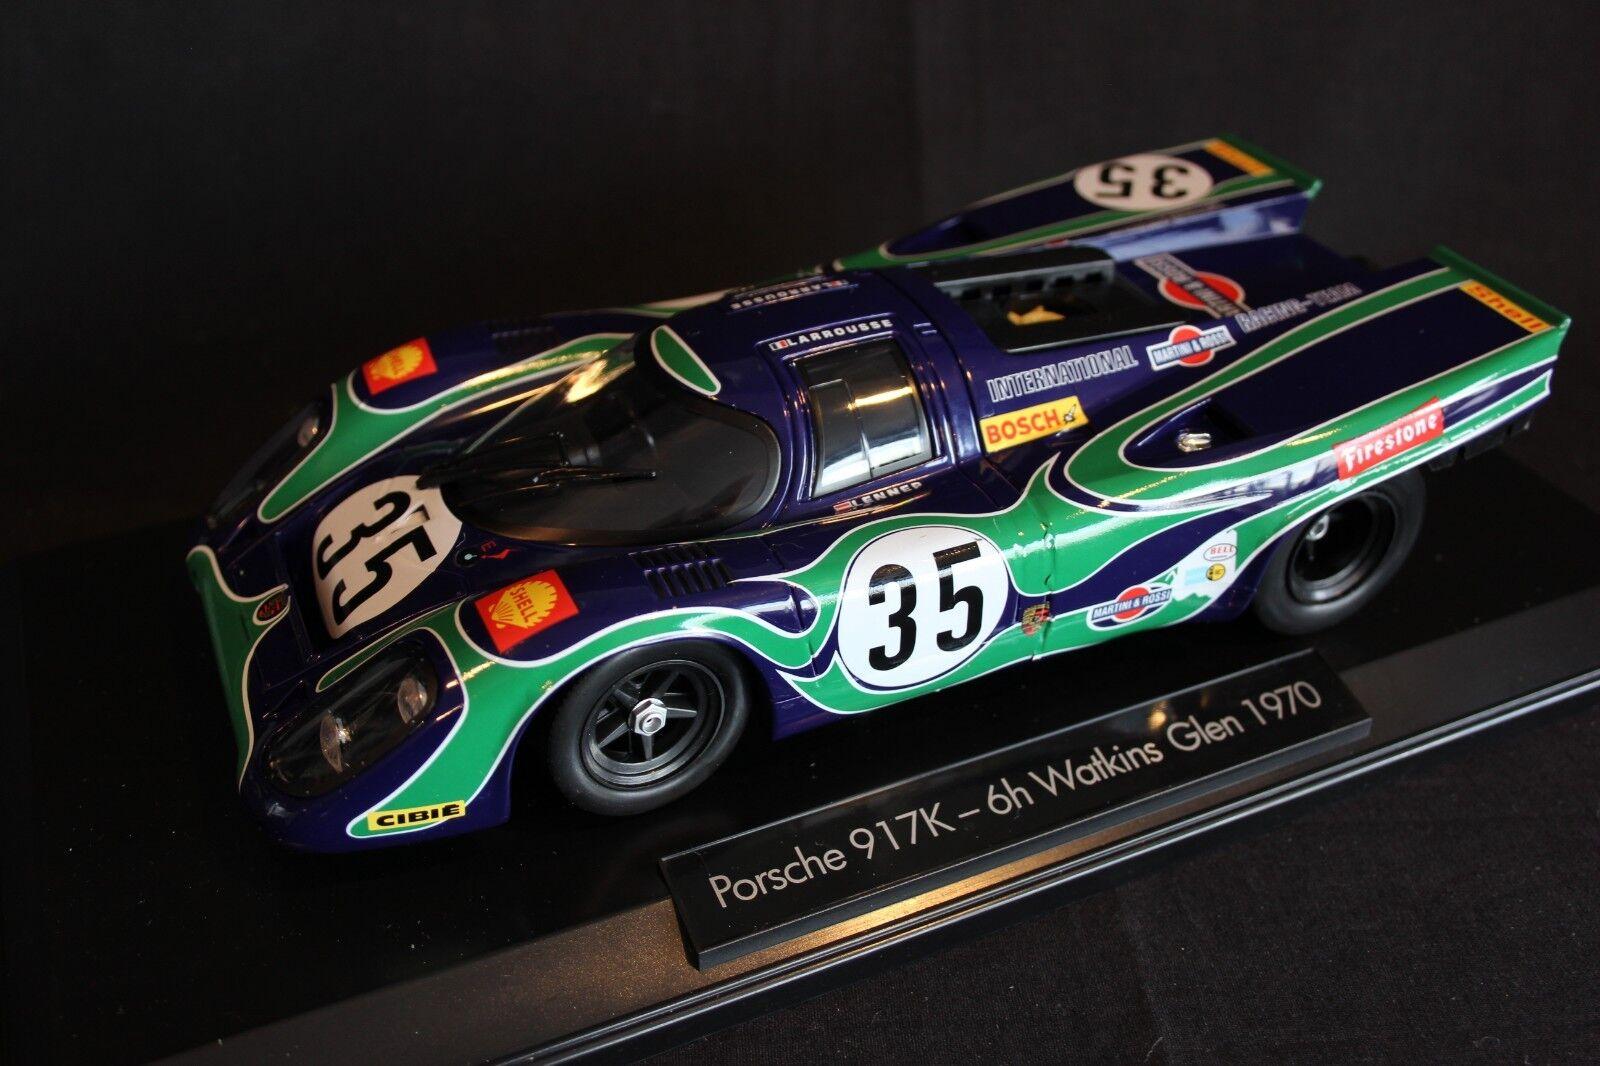 Norev Porsche 917  K 1970 1 18  2 van Lennep   Larousse 6h Watkins Glen 1970  acheter en ligne